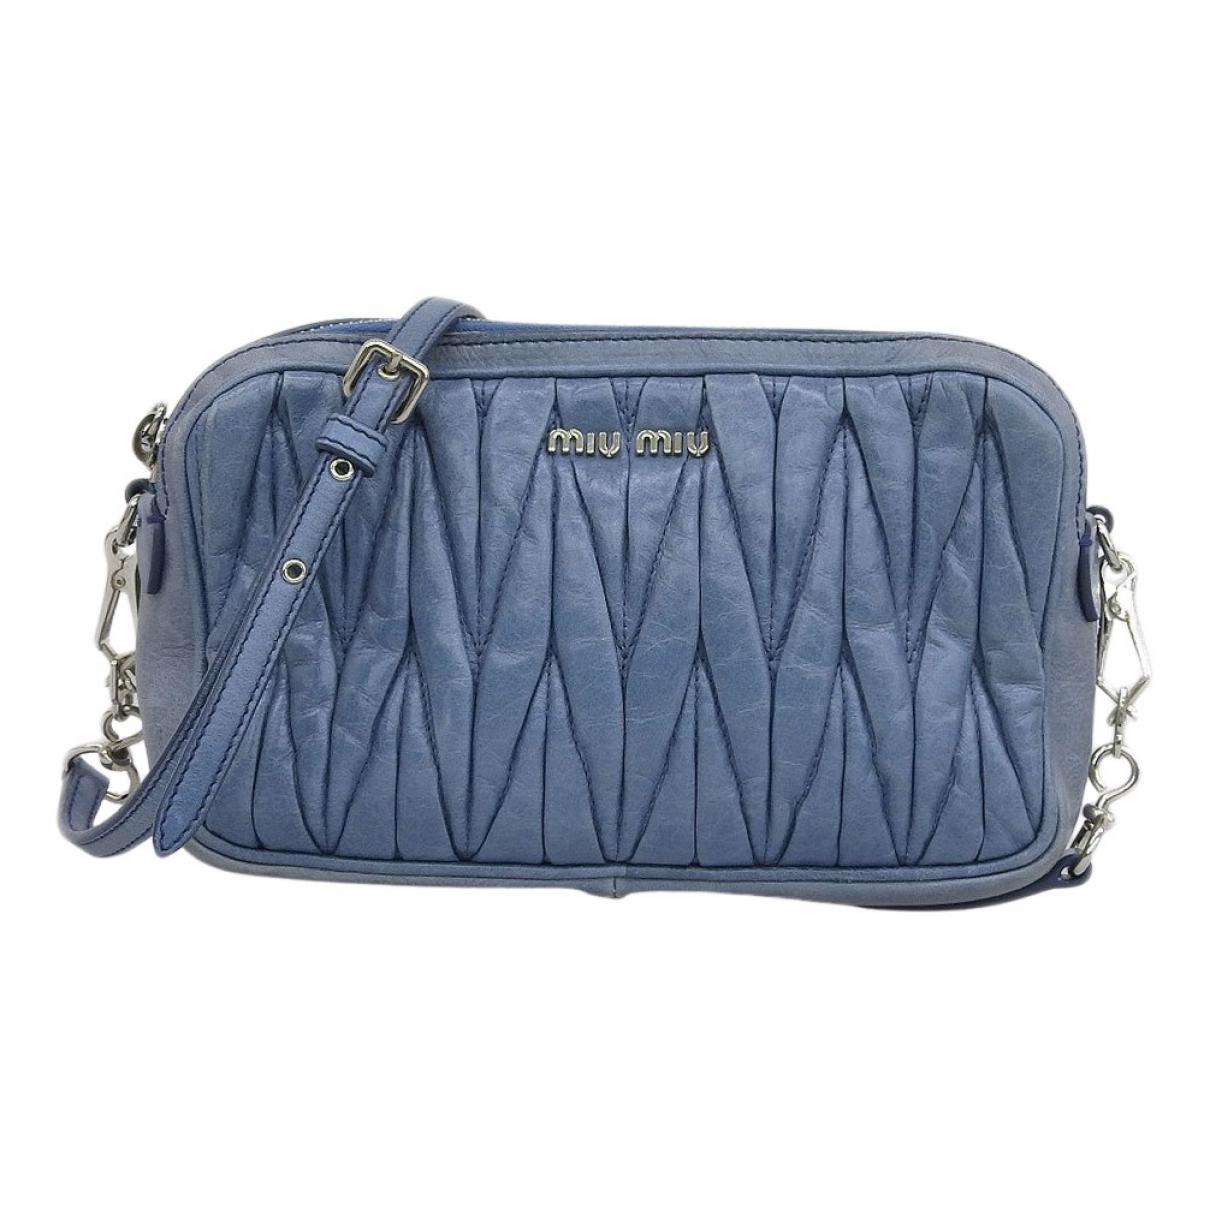 Miu Miu N Blue Leather handbag for Women N